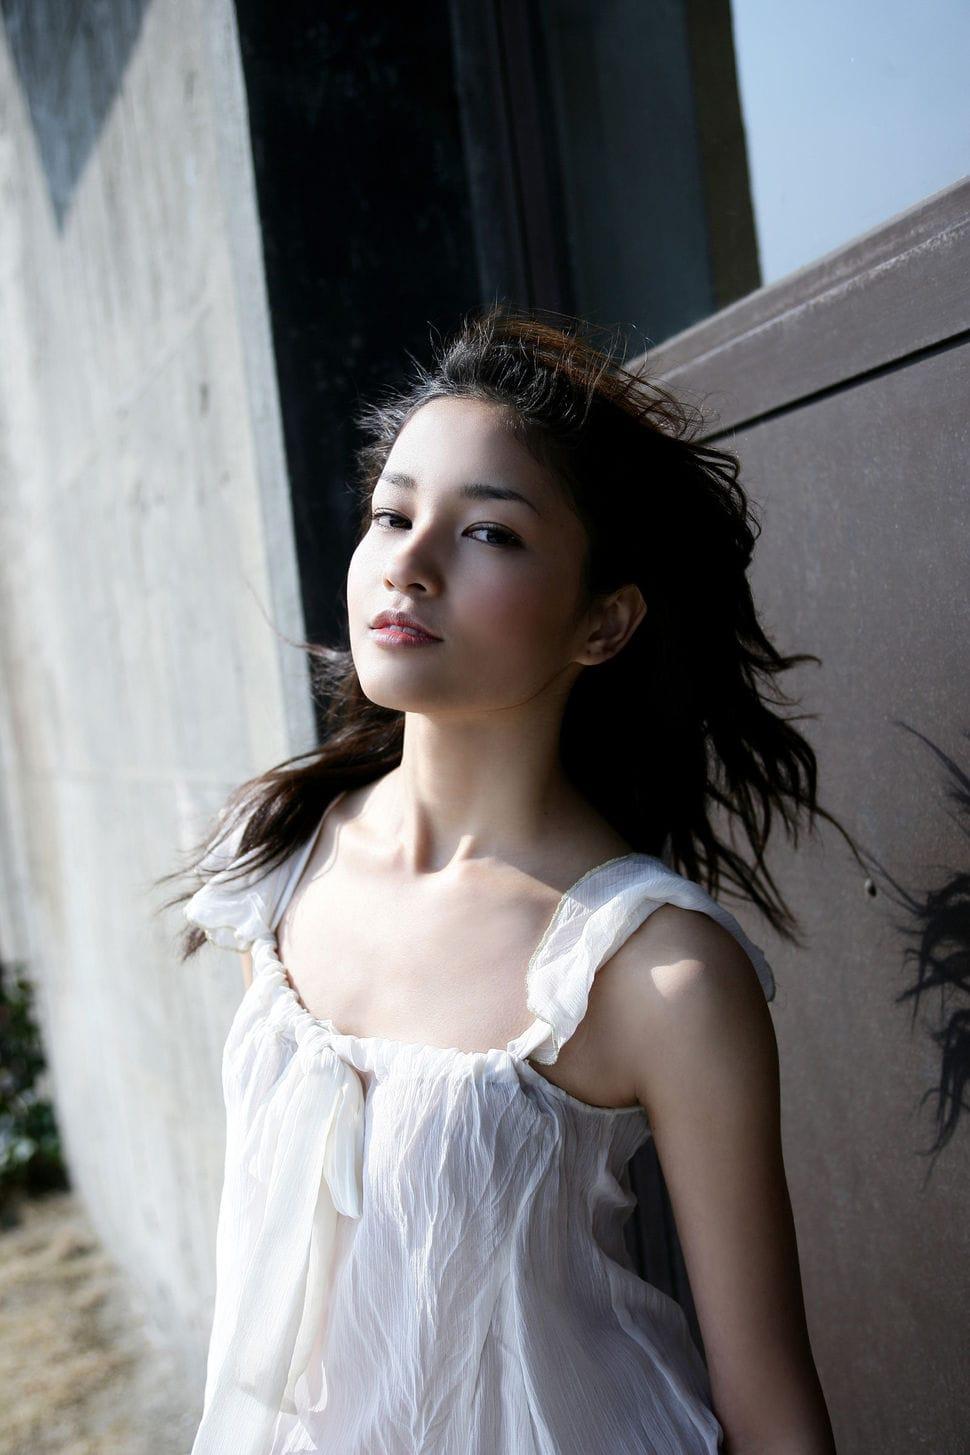 Ciara Janson (born 1987) photo